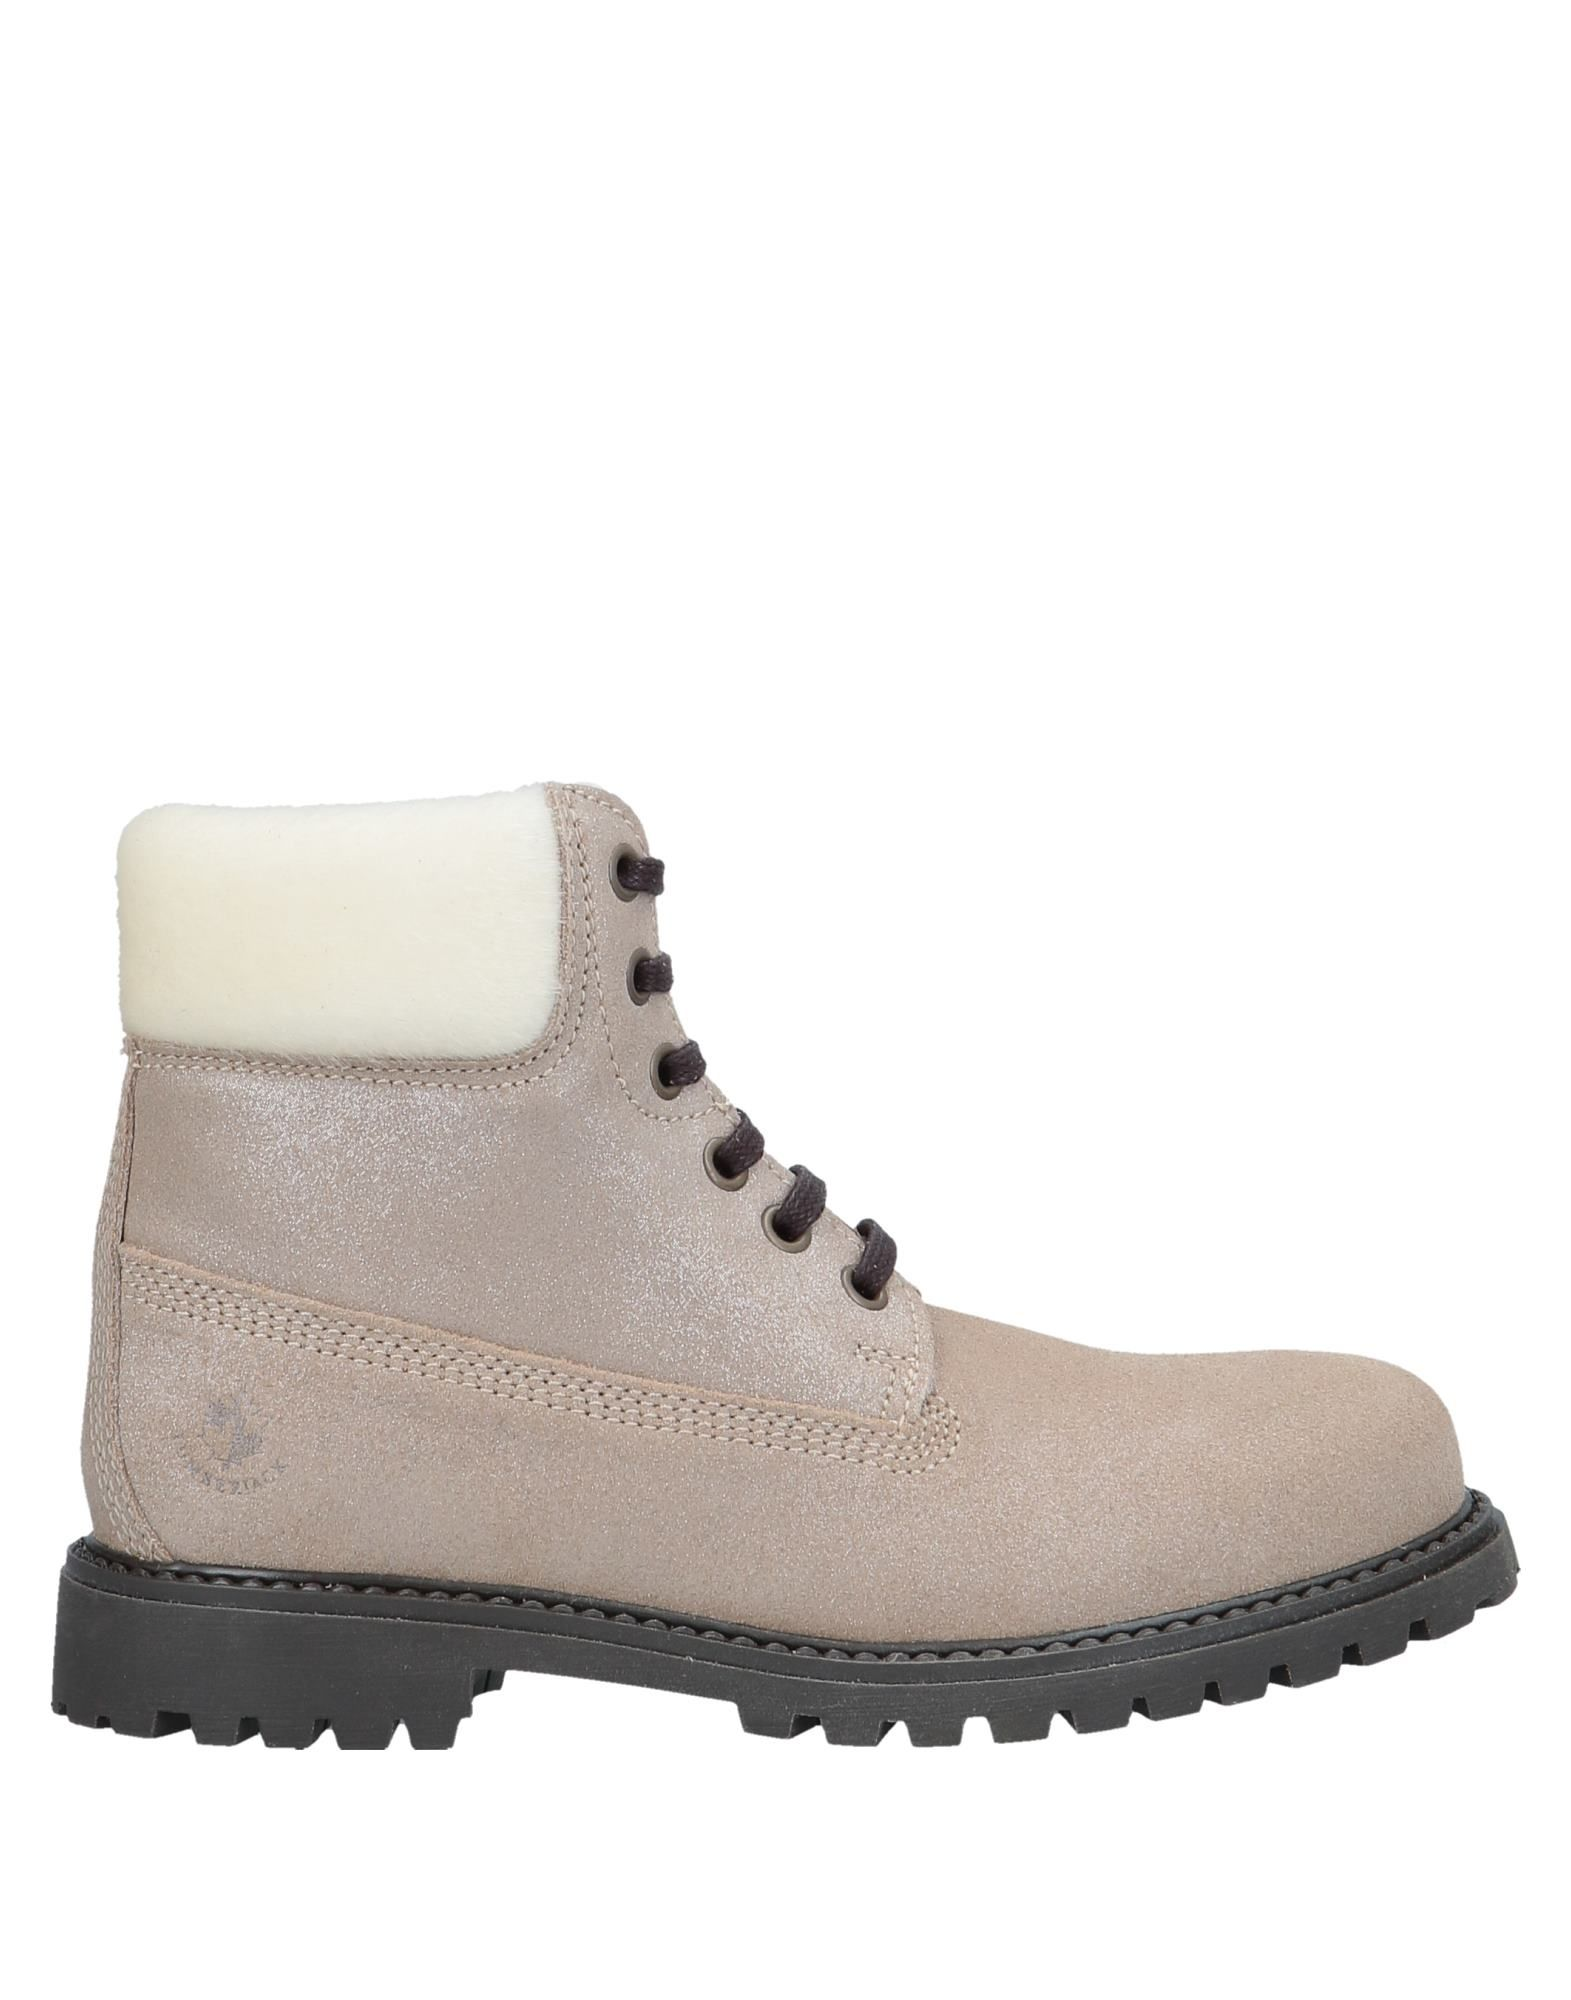 Lumberjack Stiefelette Damen  11558704RI Gute Qualität beliebte Schuhe